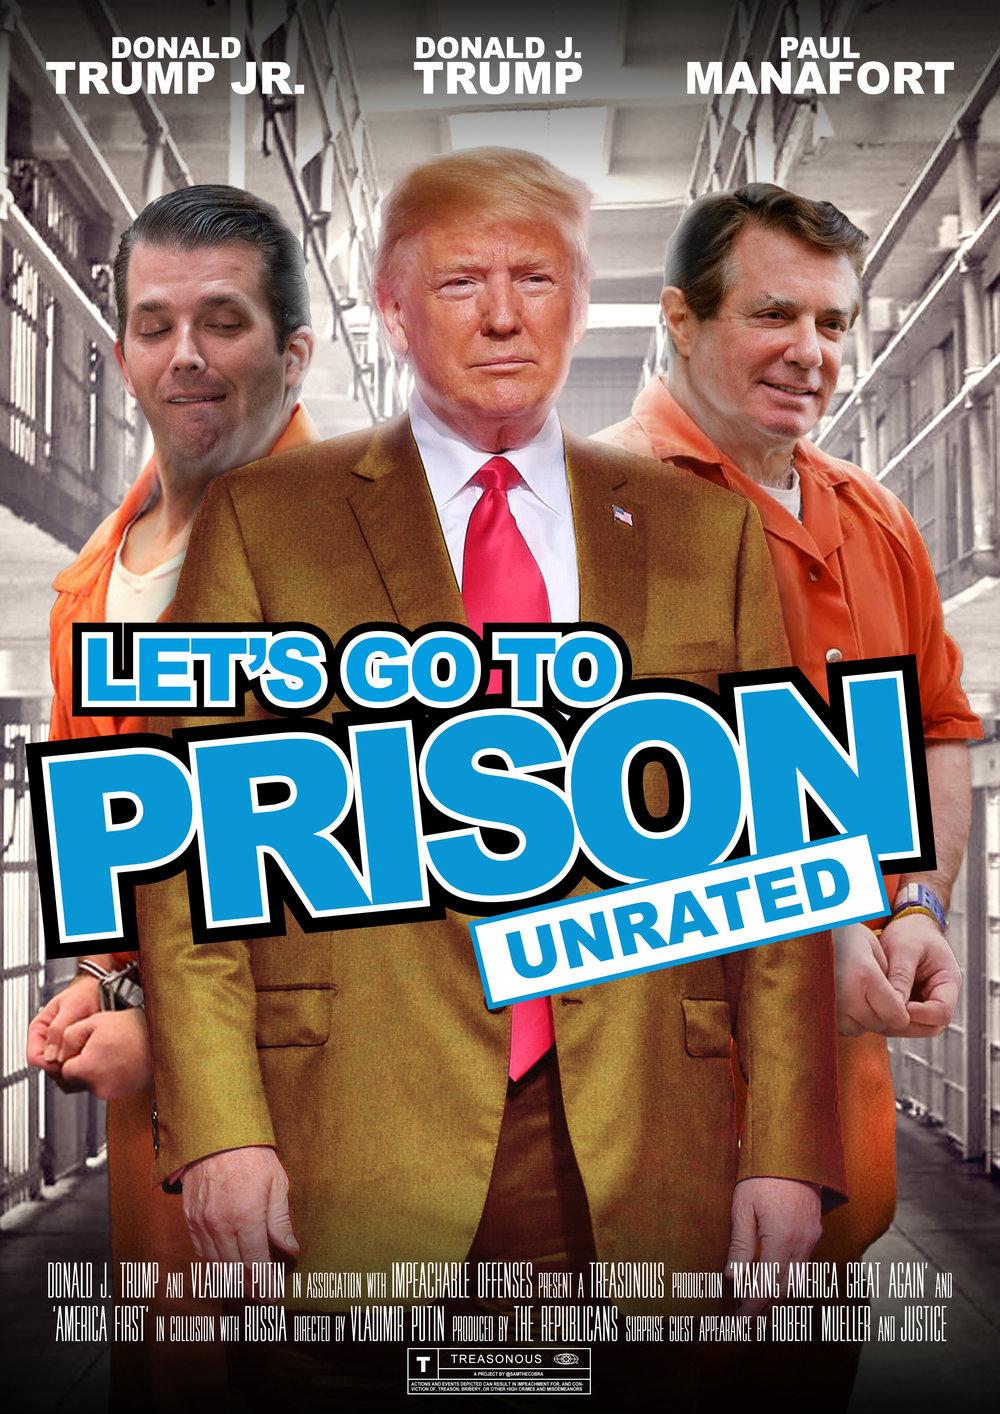 4_TrumpPoster_LetsGo.jpg